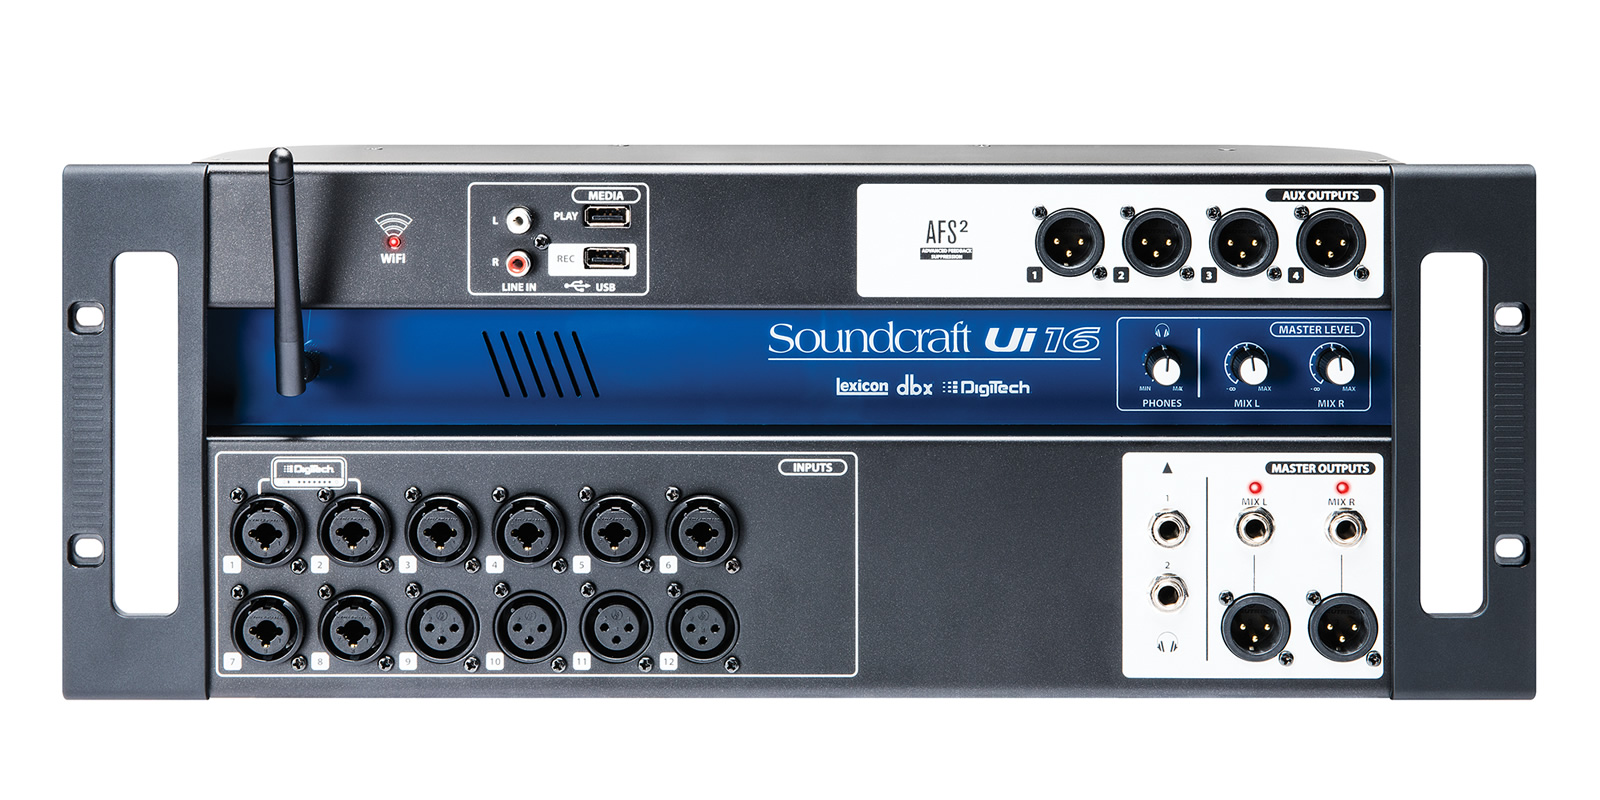 Ui16 Soundcraft Professional Audio Mixers Automatic Street Light Circuit Diagram